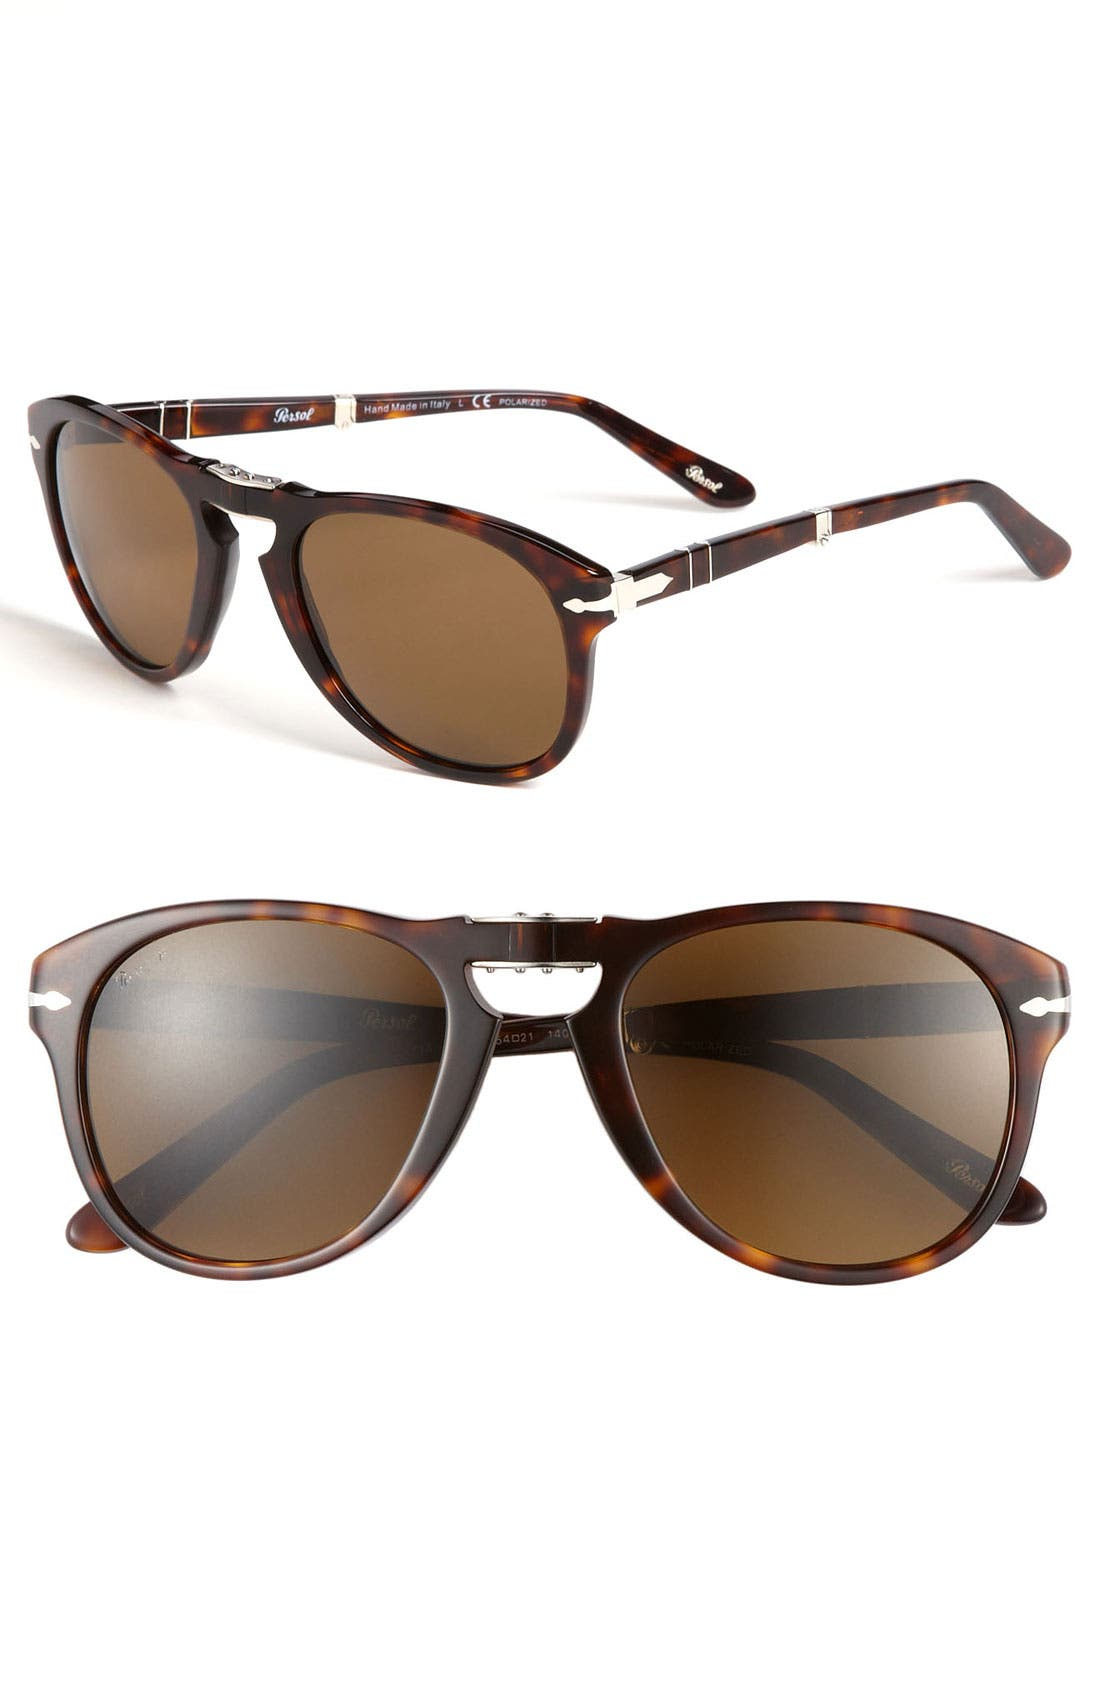 Main Image - Persol '714' 57mm Folding Polarized Keyhole Sunglasses